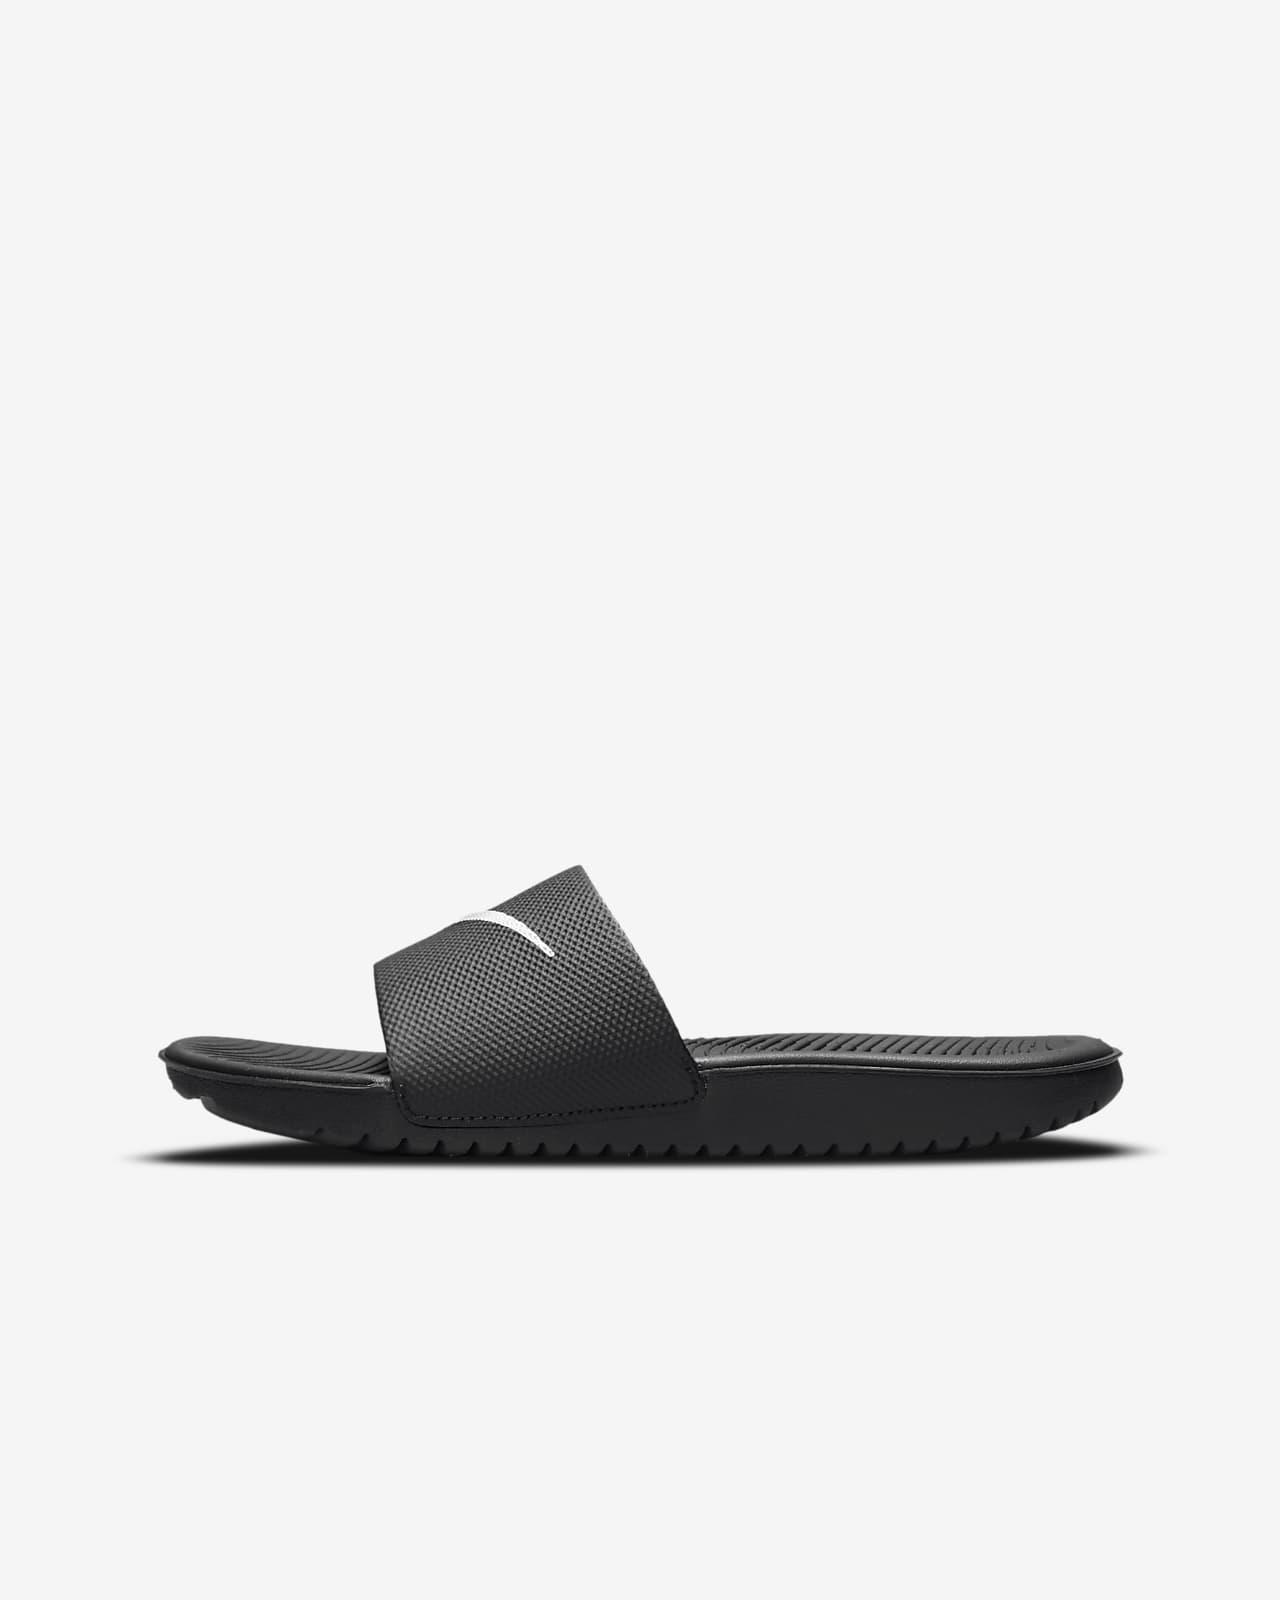 Toffel Nike Kawa för barn/ungdom